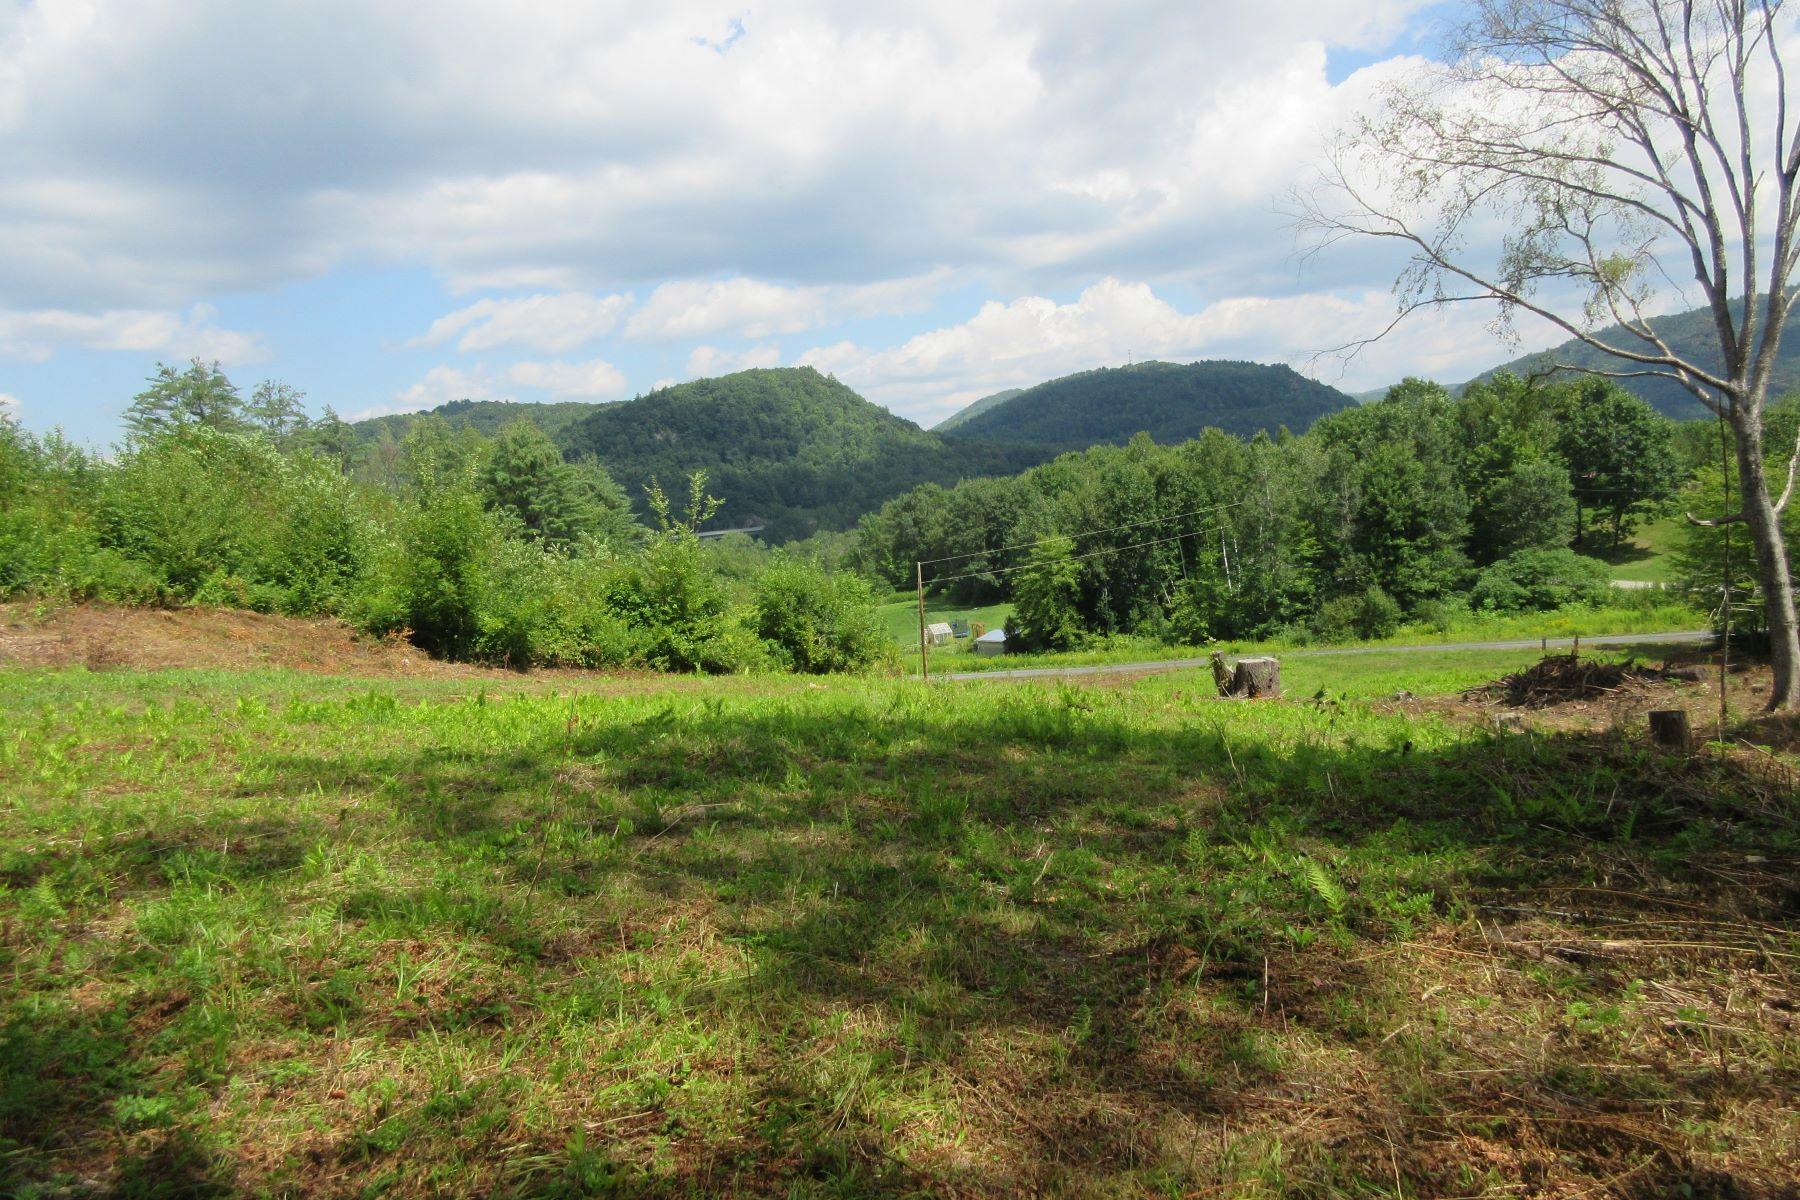 Земля для того Продажа на Easterly views, near Sharon Academy 7 Lukes Ln, Sharon, Вермонт, 05065 Соединенные Штаты